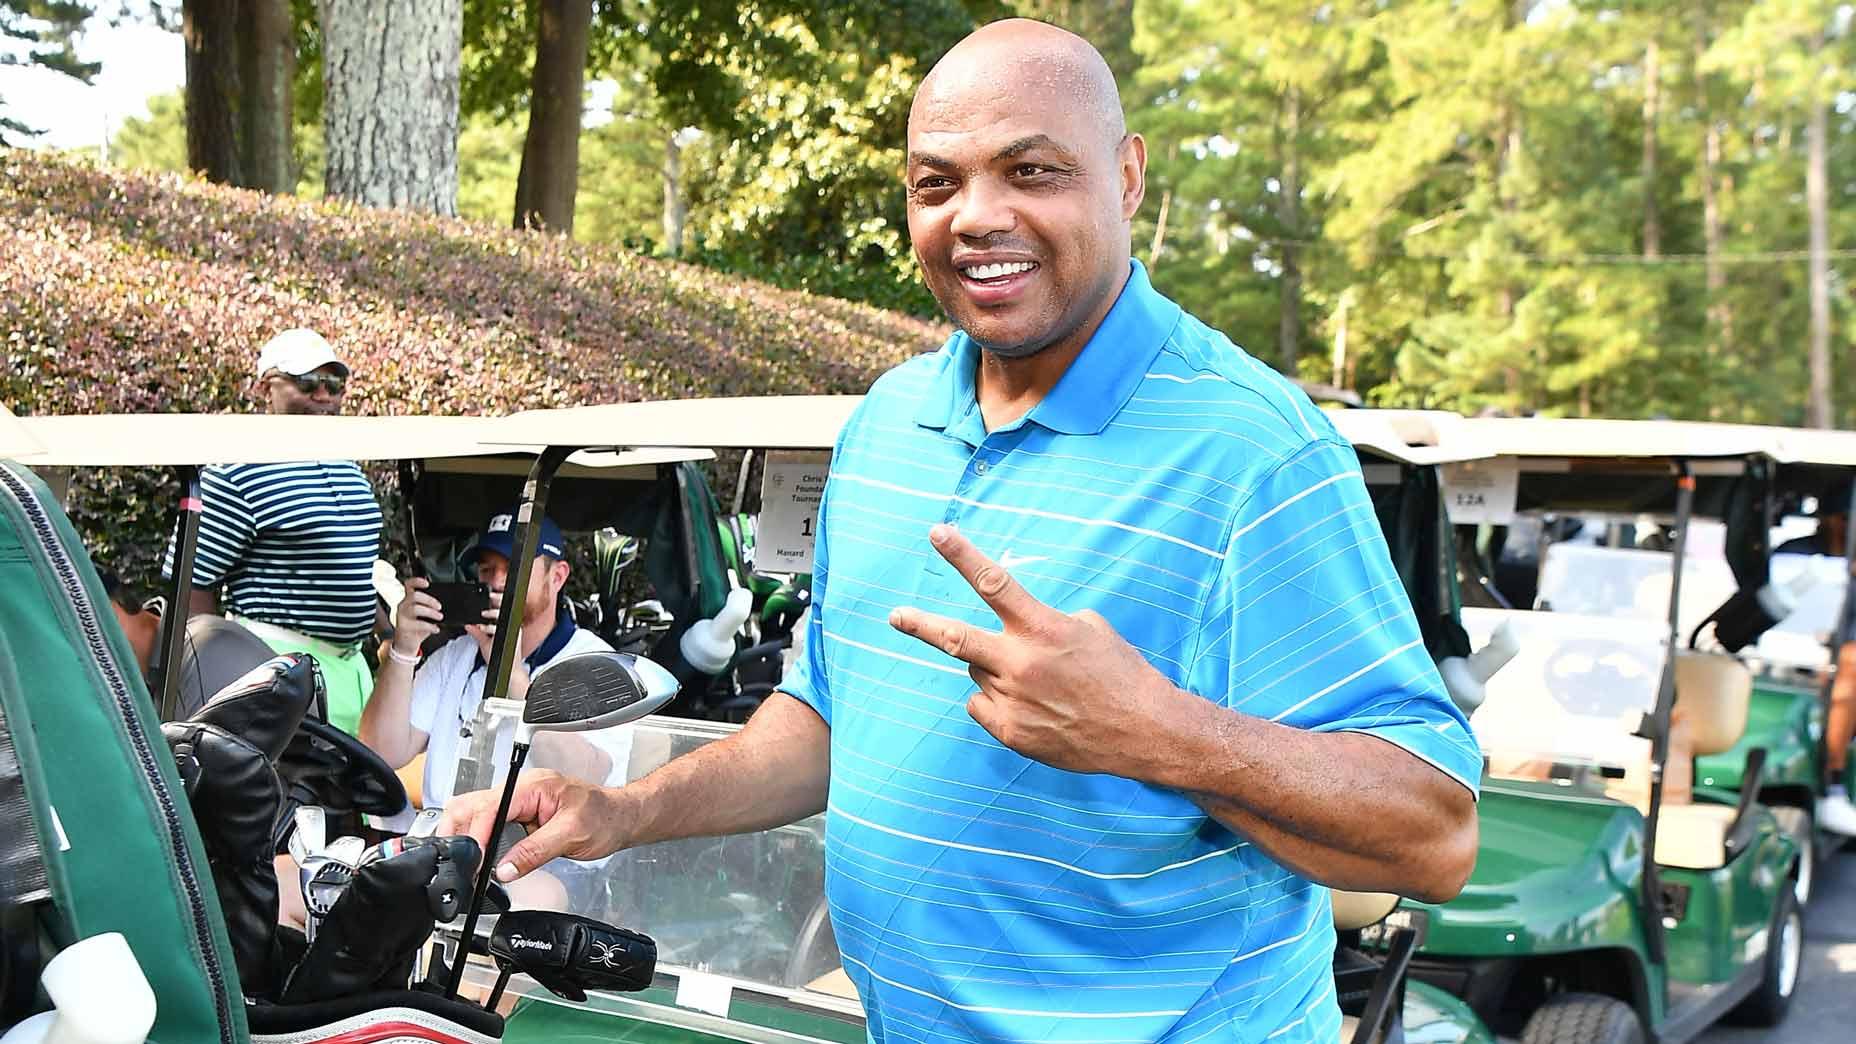 Charles Barkley at Stone Canyon Golf Club